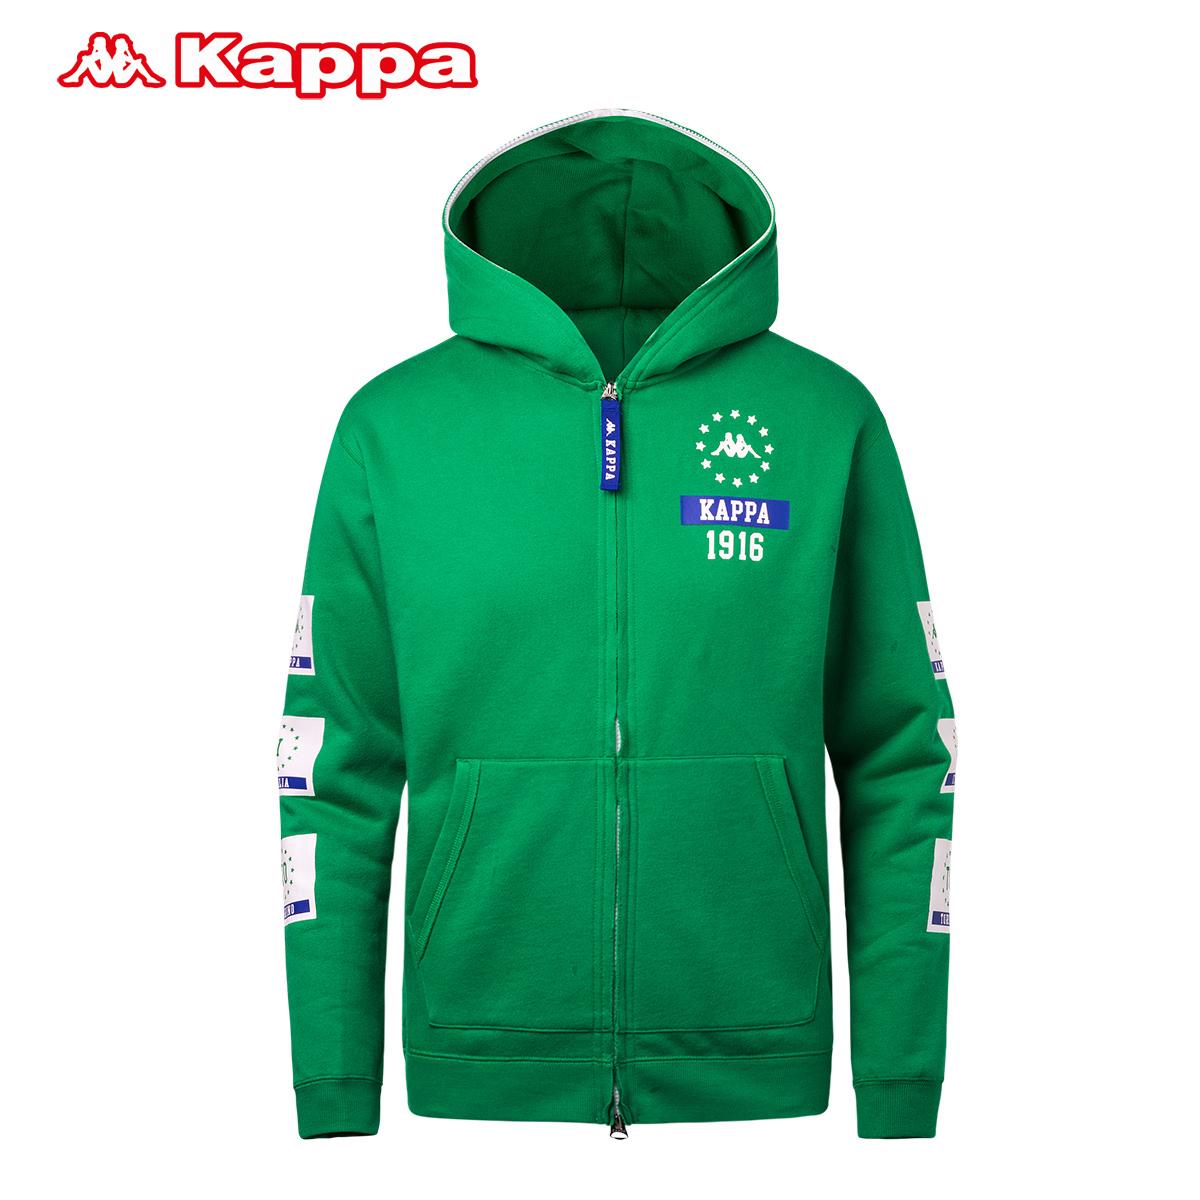 Kappa卡帕 男子运动卫衣运动上衣 休闲帽衫休闲运动装|K0512MK32